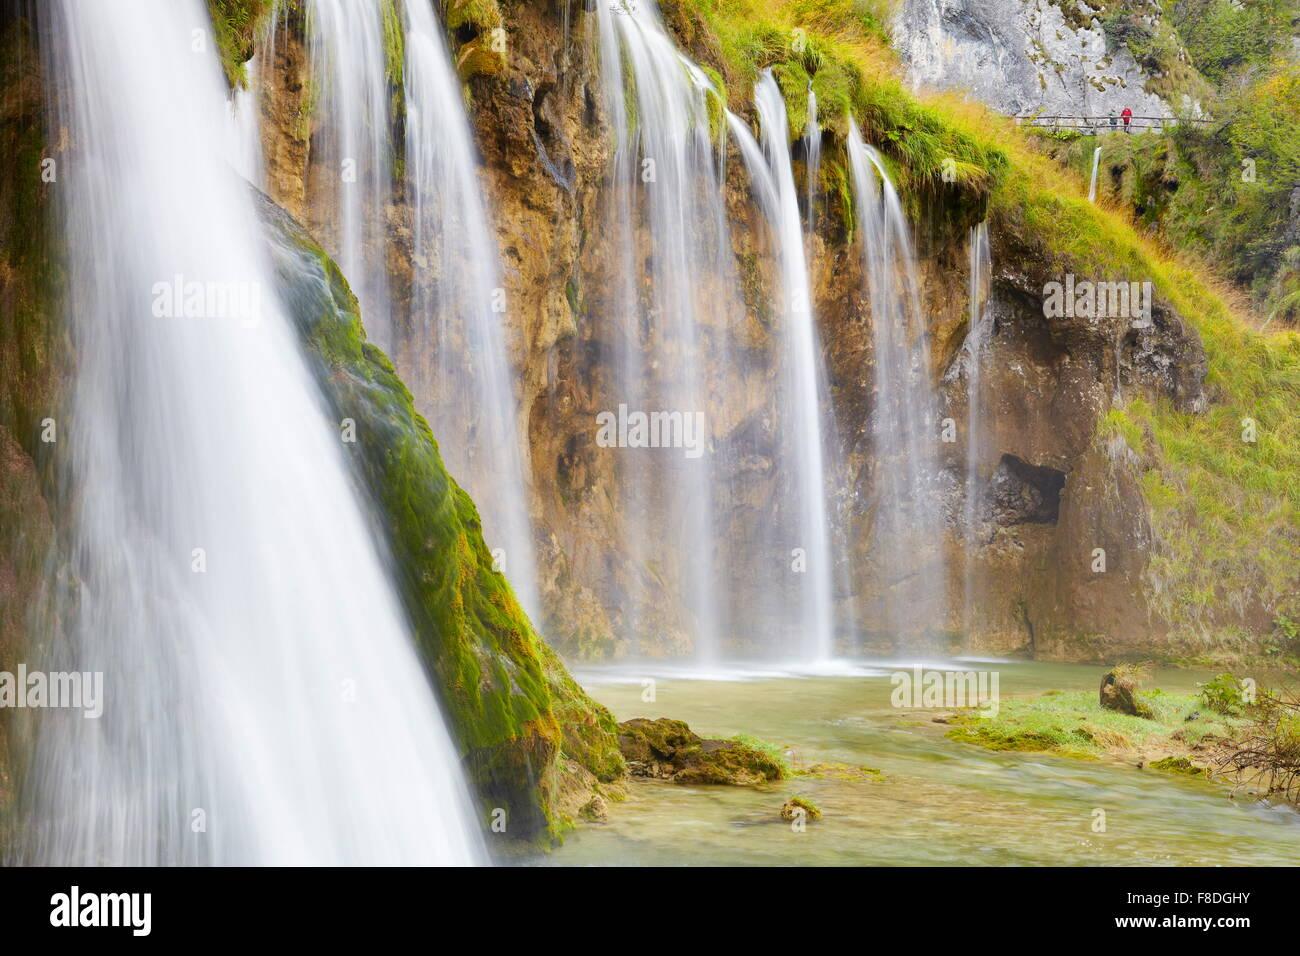 Plitvice Lakes National Park, Croatia, UNESCO - Stock Image